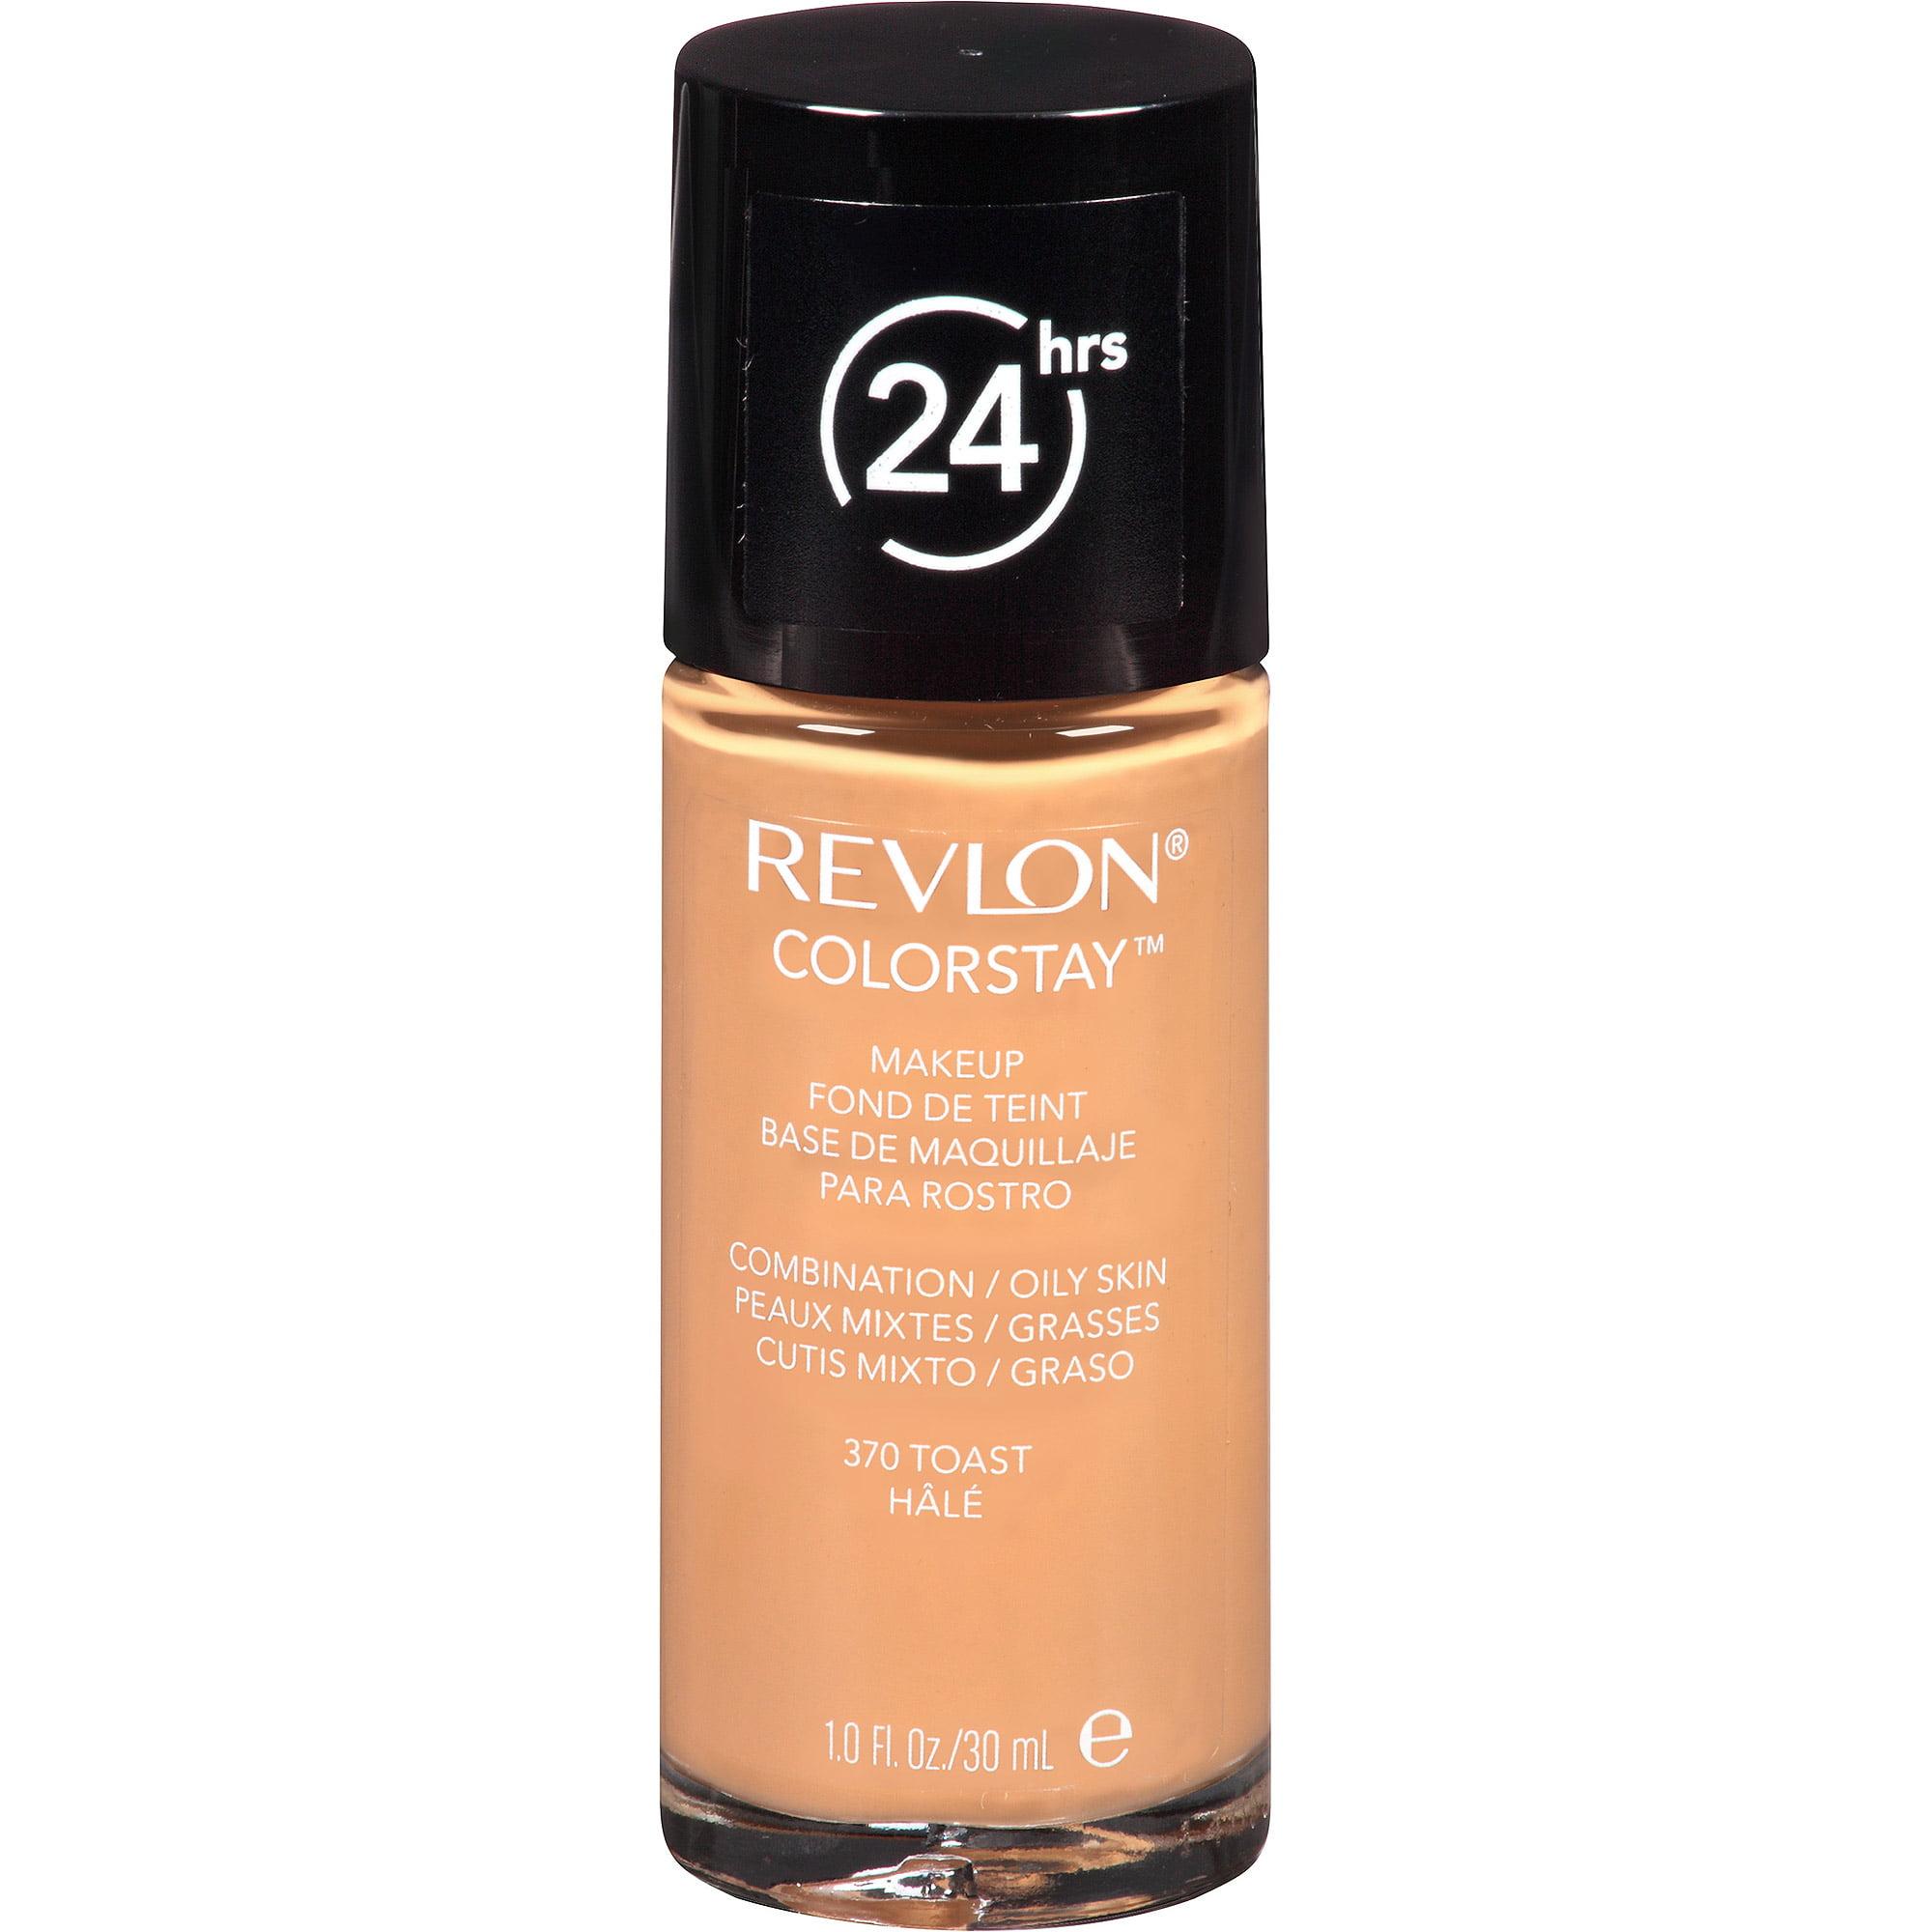 Revlon ColorStay Makeup for Combination/Oily Skin, 370 Toast, 1 fl oz